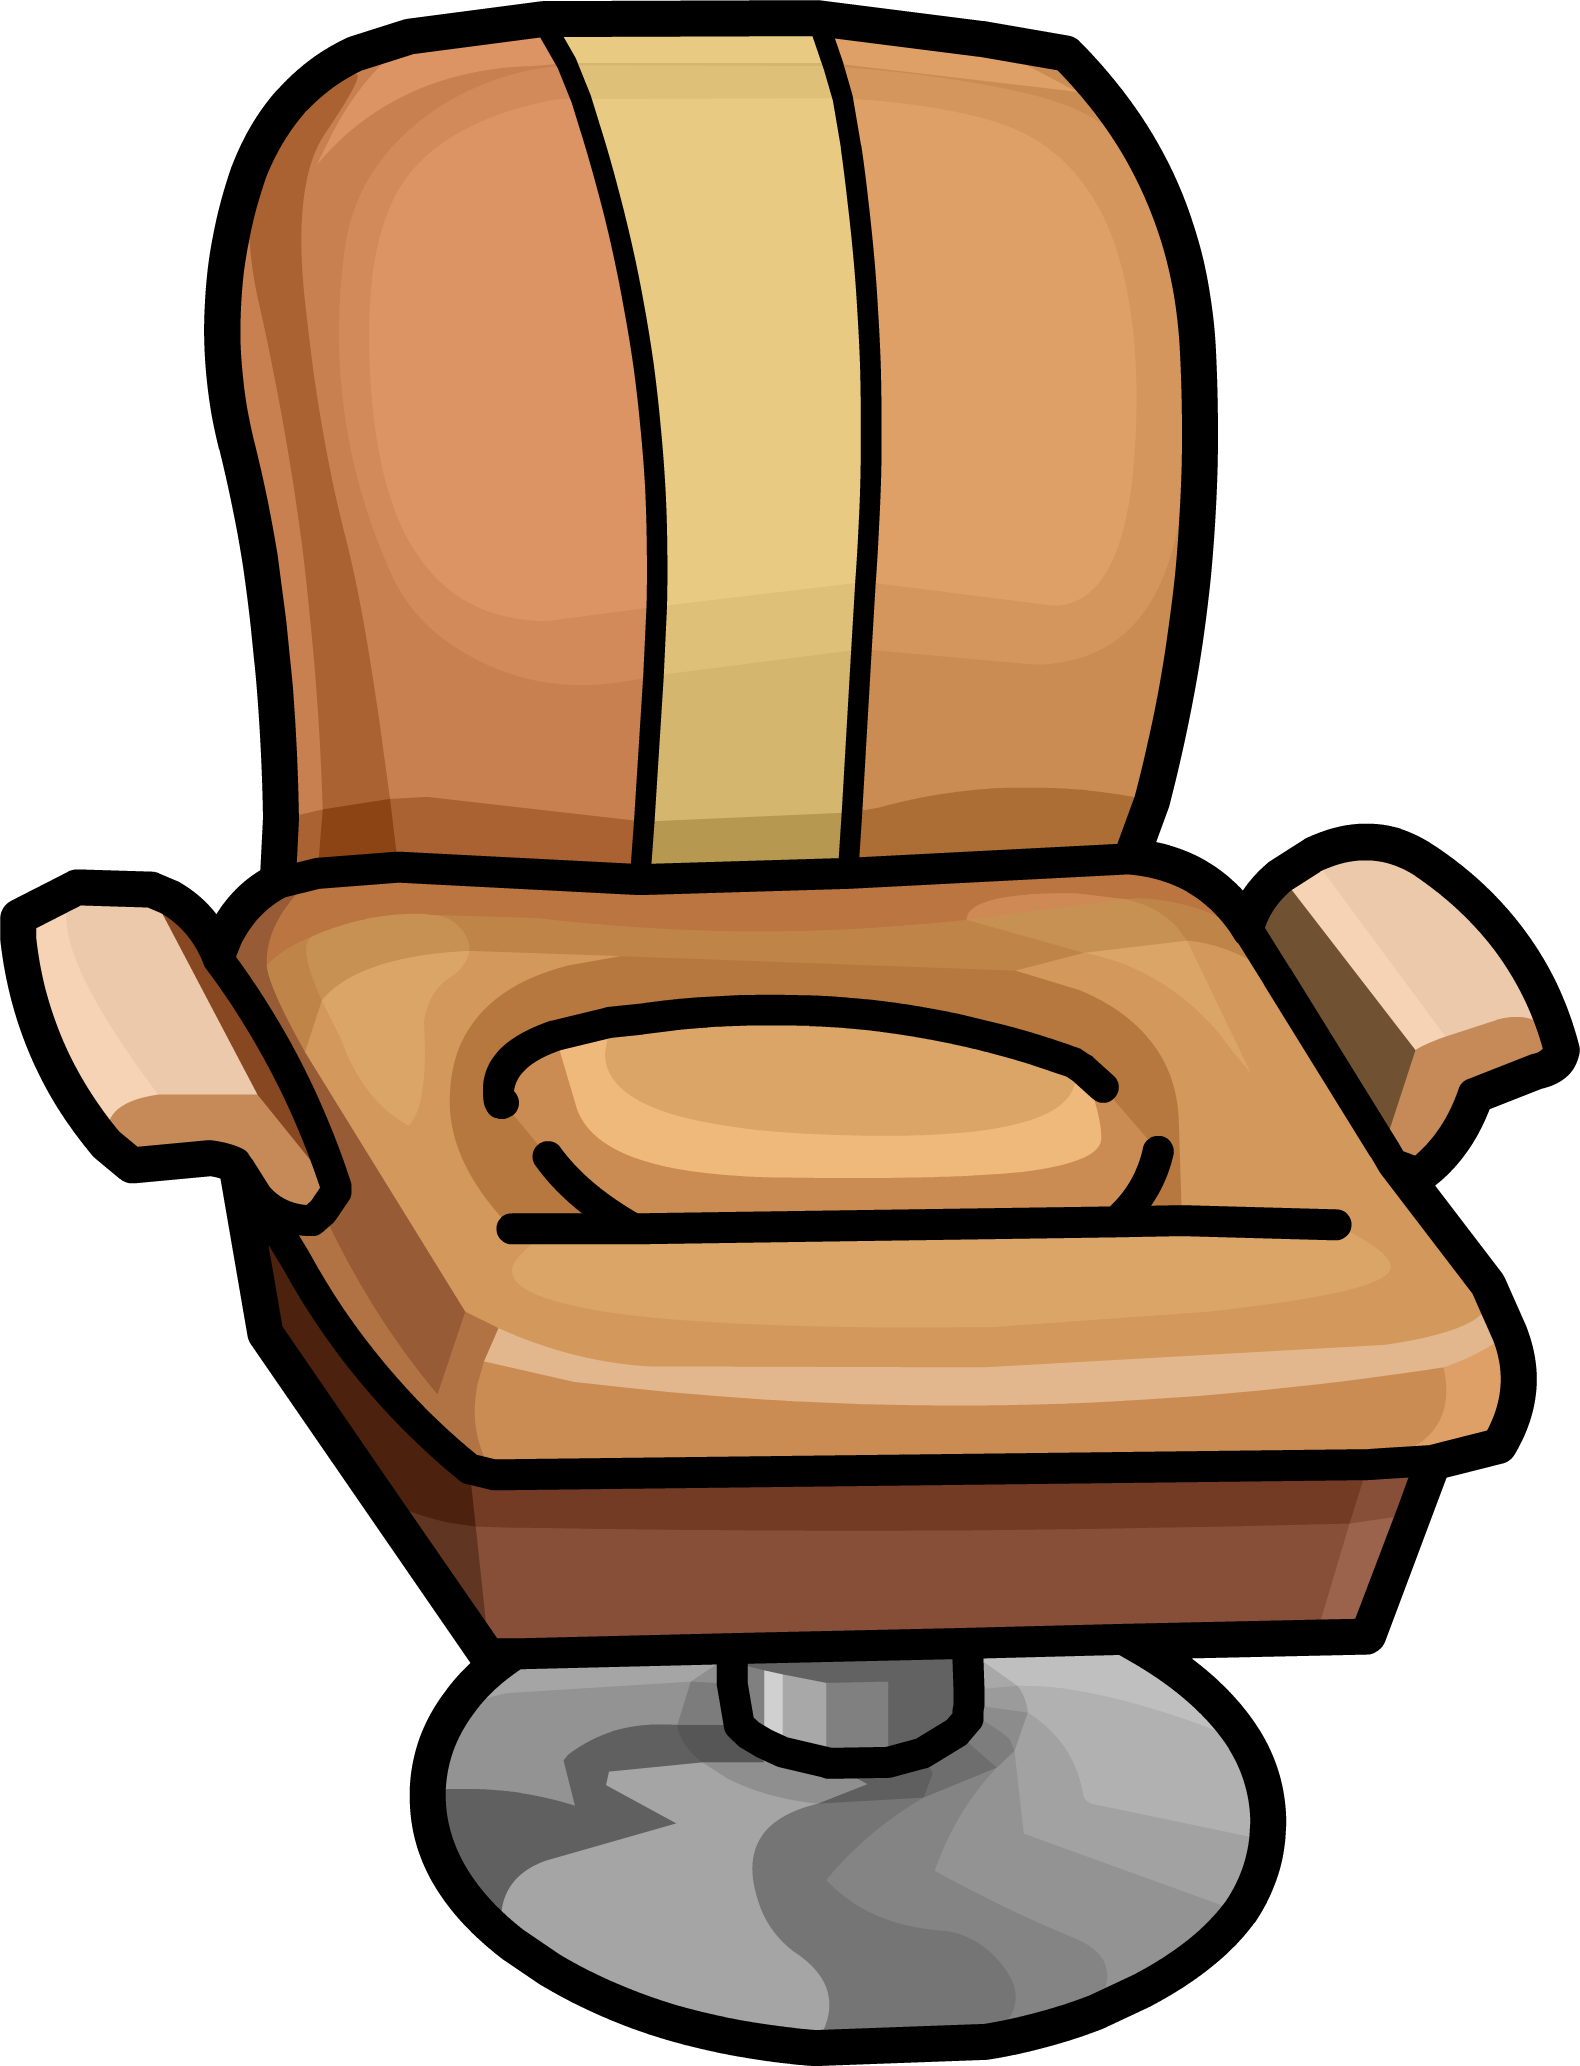 Salon chair rewritten wiki. Maracas clipart club penguin